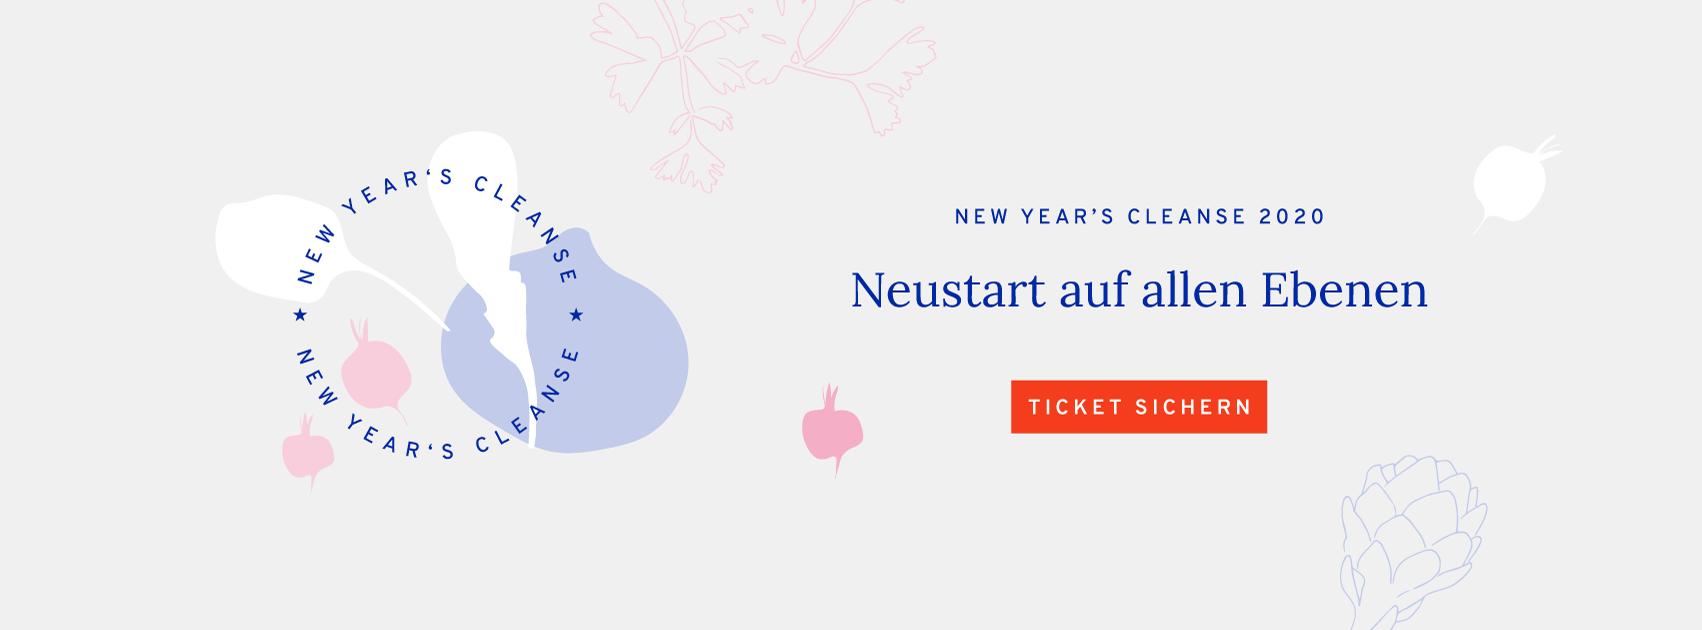 new-years-cleanse-2020_facebook-titelbild-2_gross-1